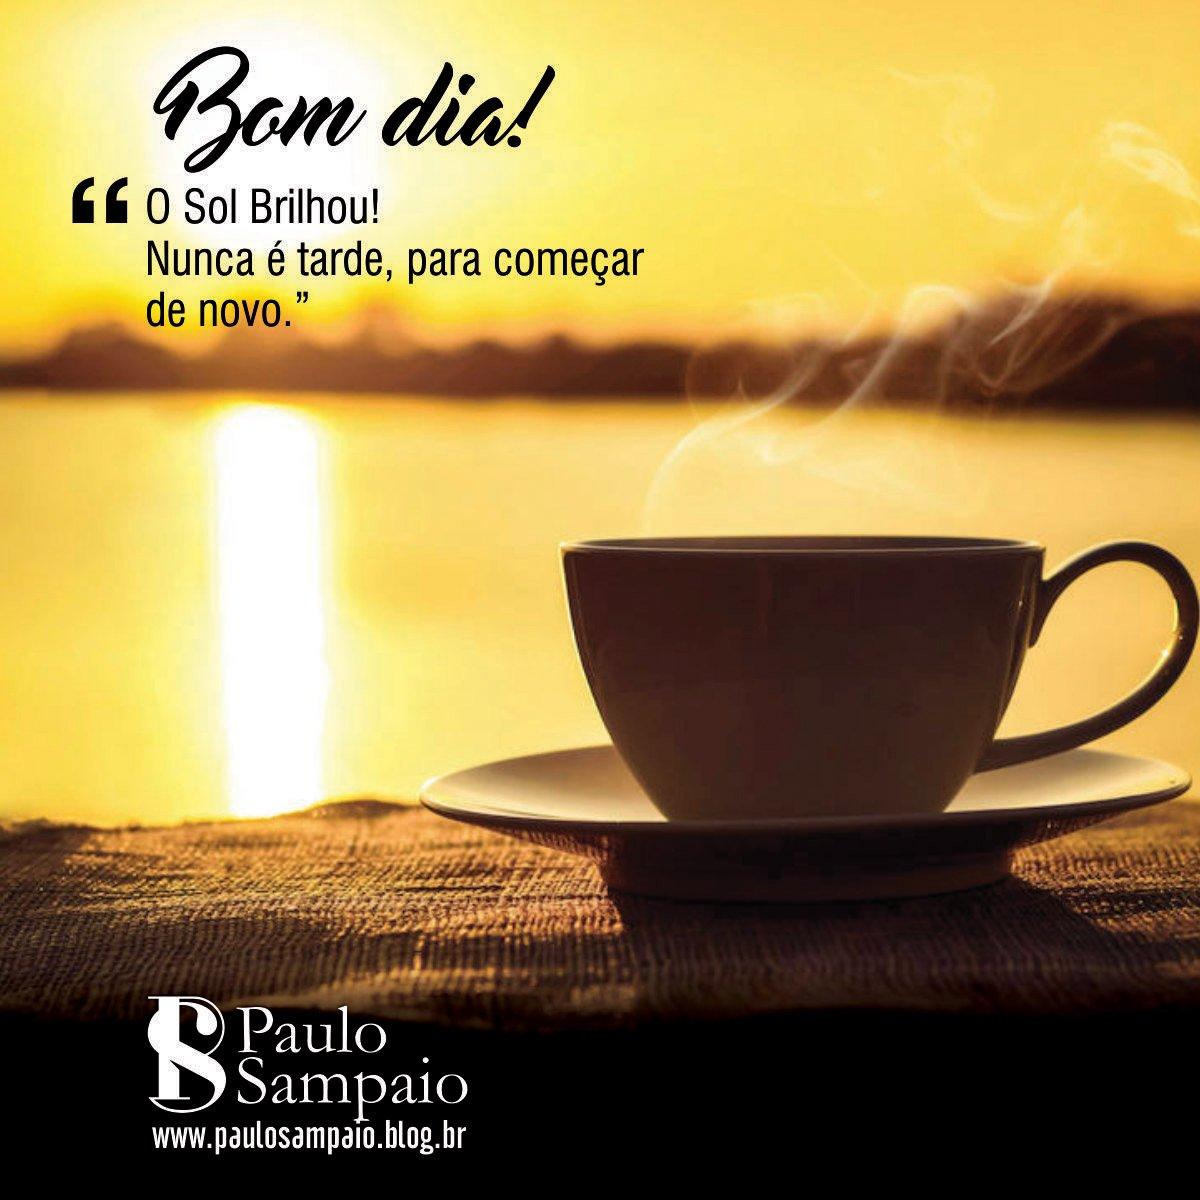 Paulorobertosampaio On Twitter Bomdia Dica Do Dia